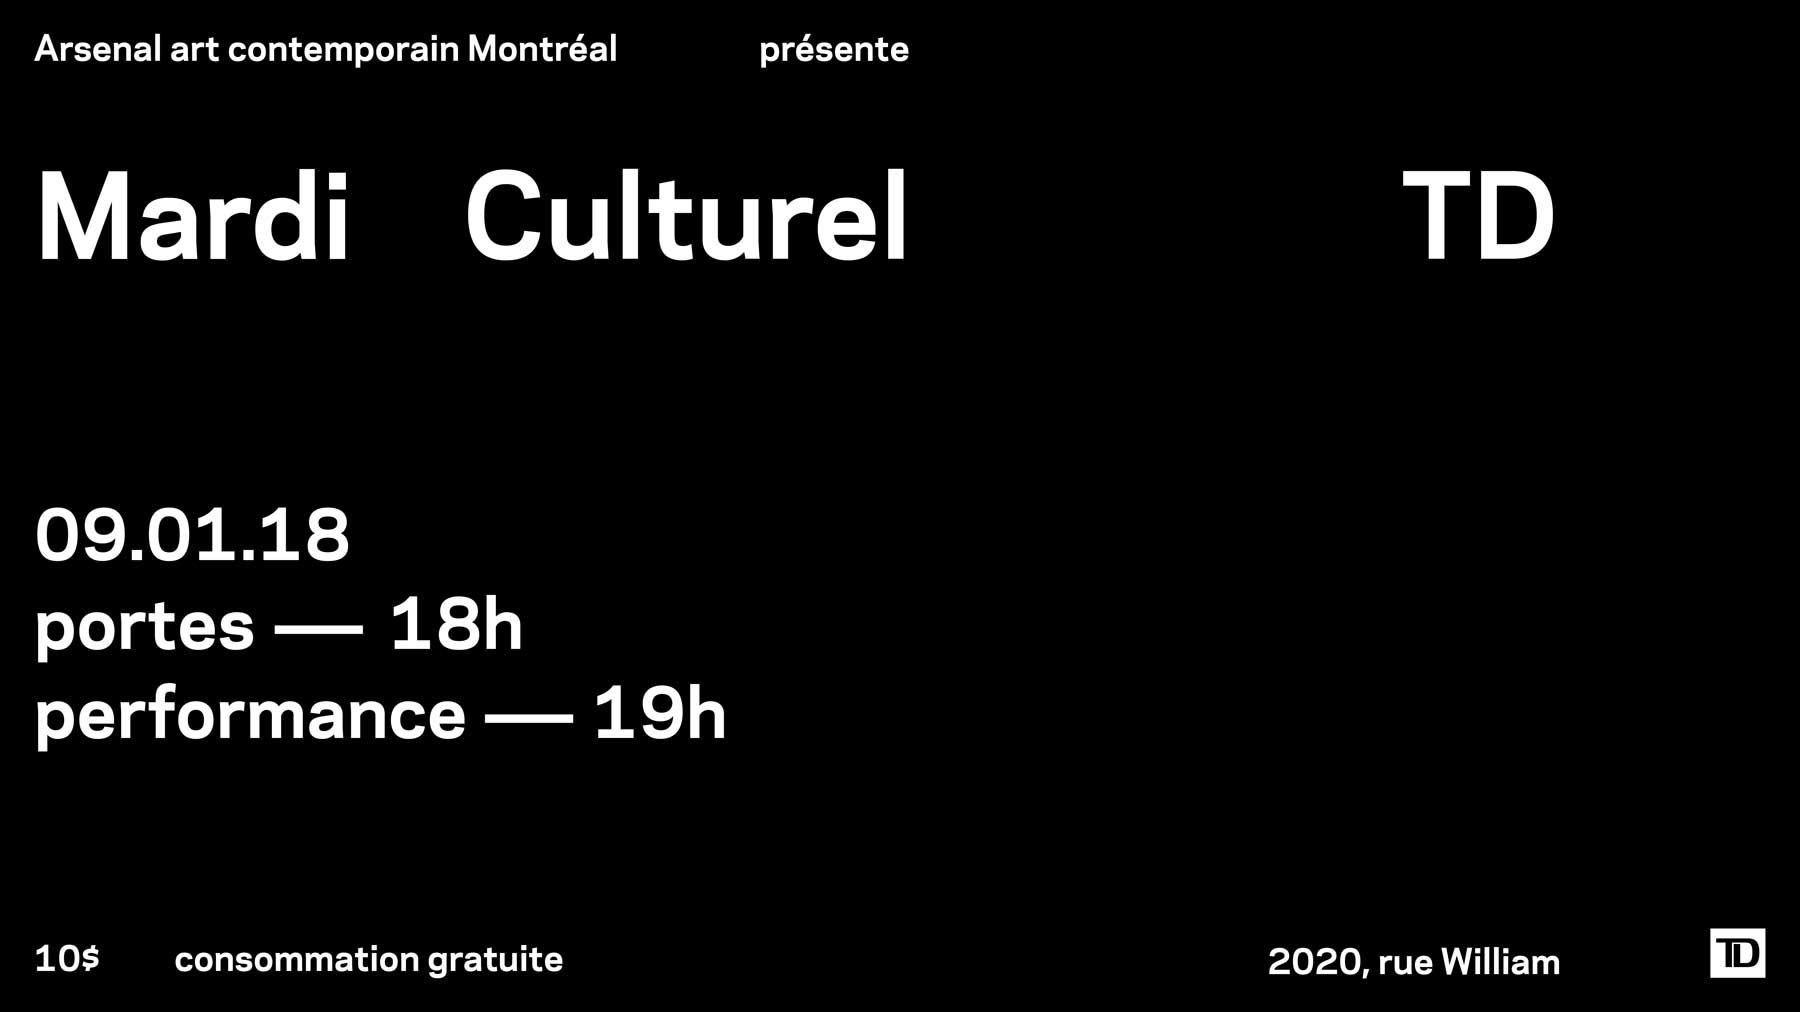 mctd-2018-01-evening-launch-td-cultural-tuesday-karl-lemieux.jpg